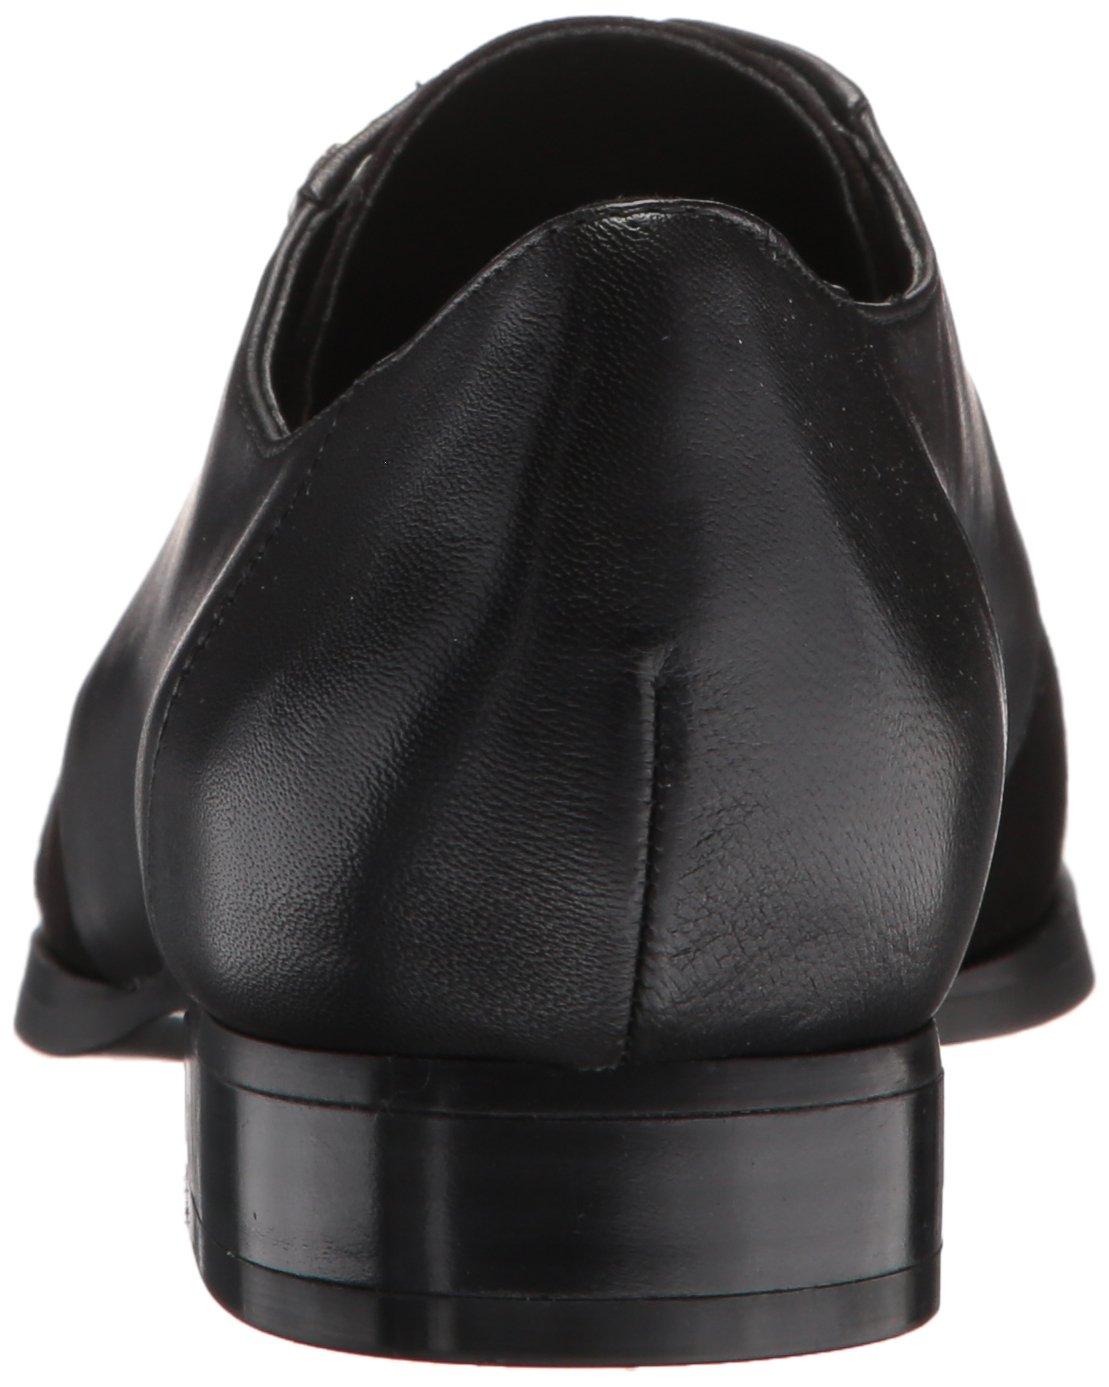 Nine West Women's Here Leather Uniform Dress Shoe, Black/Multi Leather, 5 M US by Nine West (Image #2)